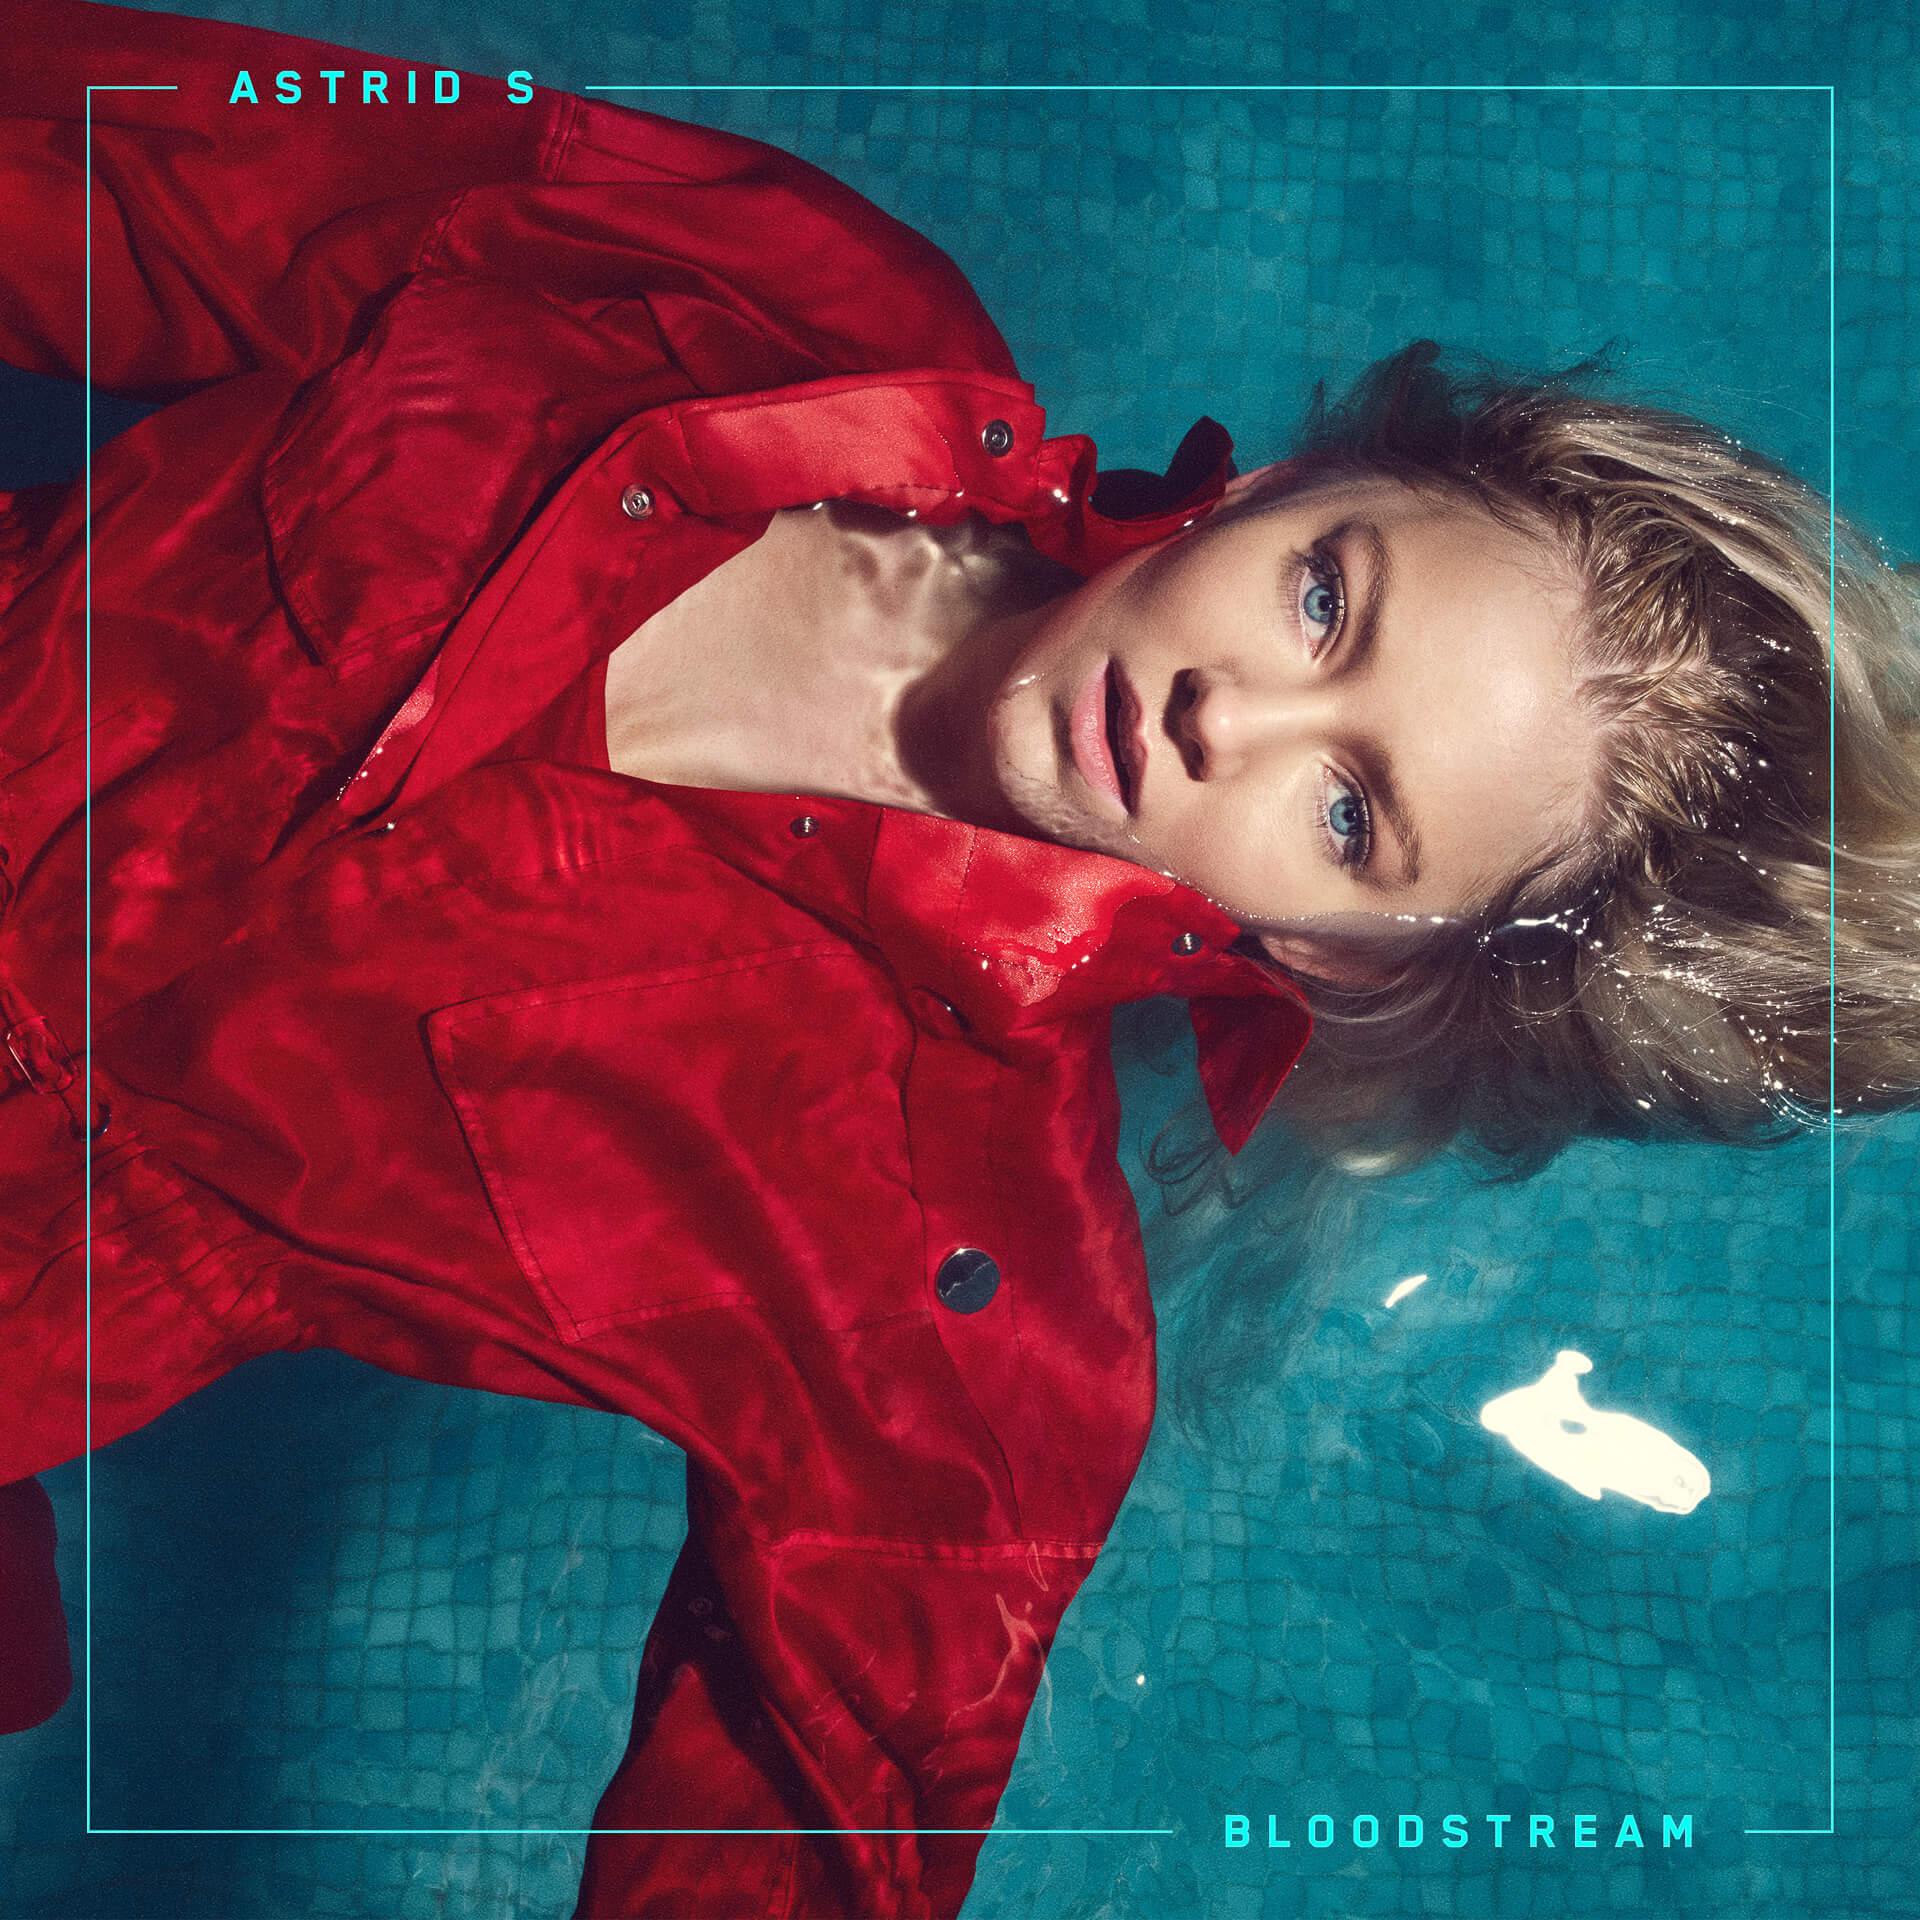 Astrid S Bloodstream_final